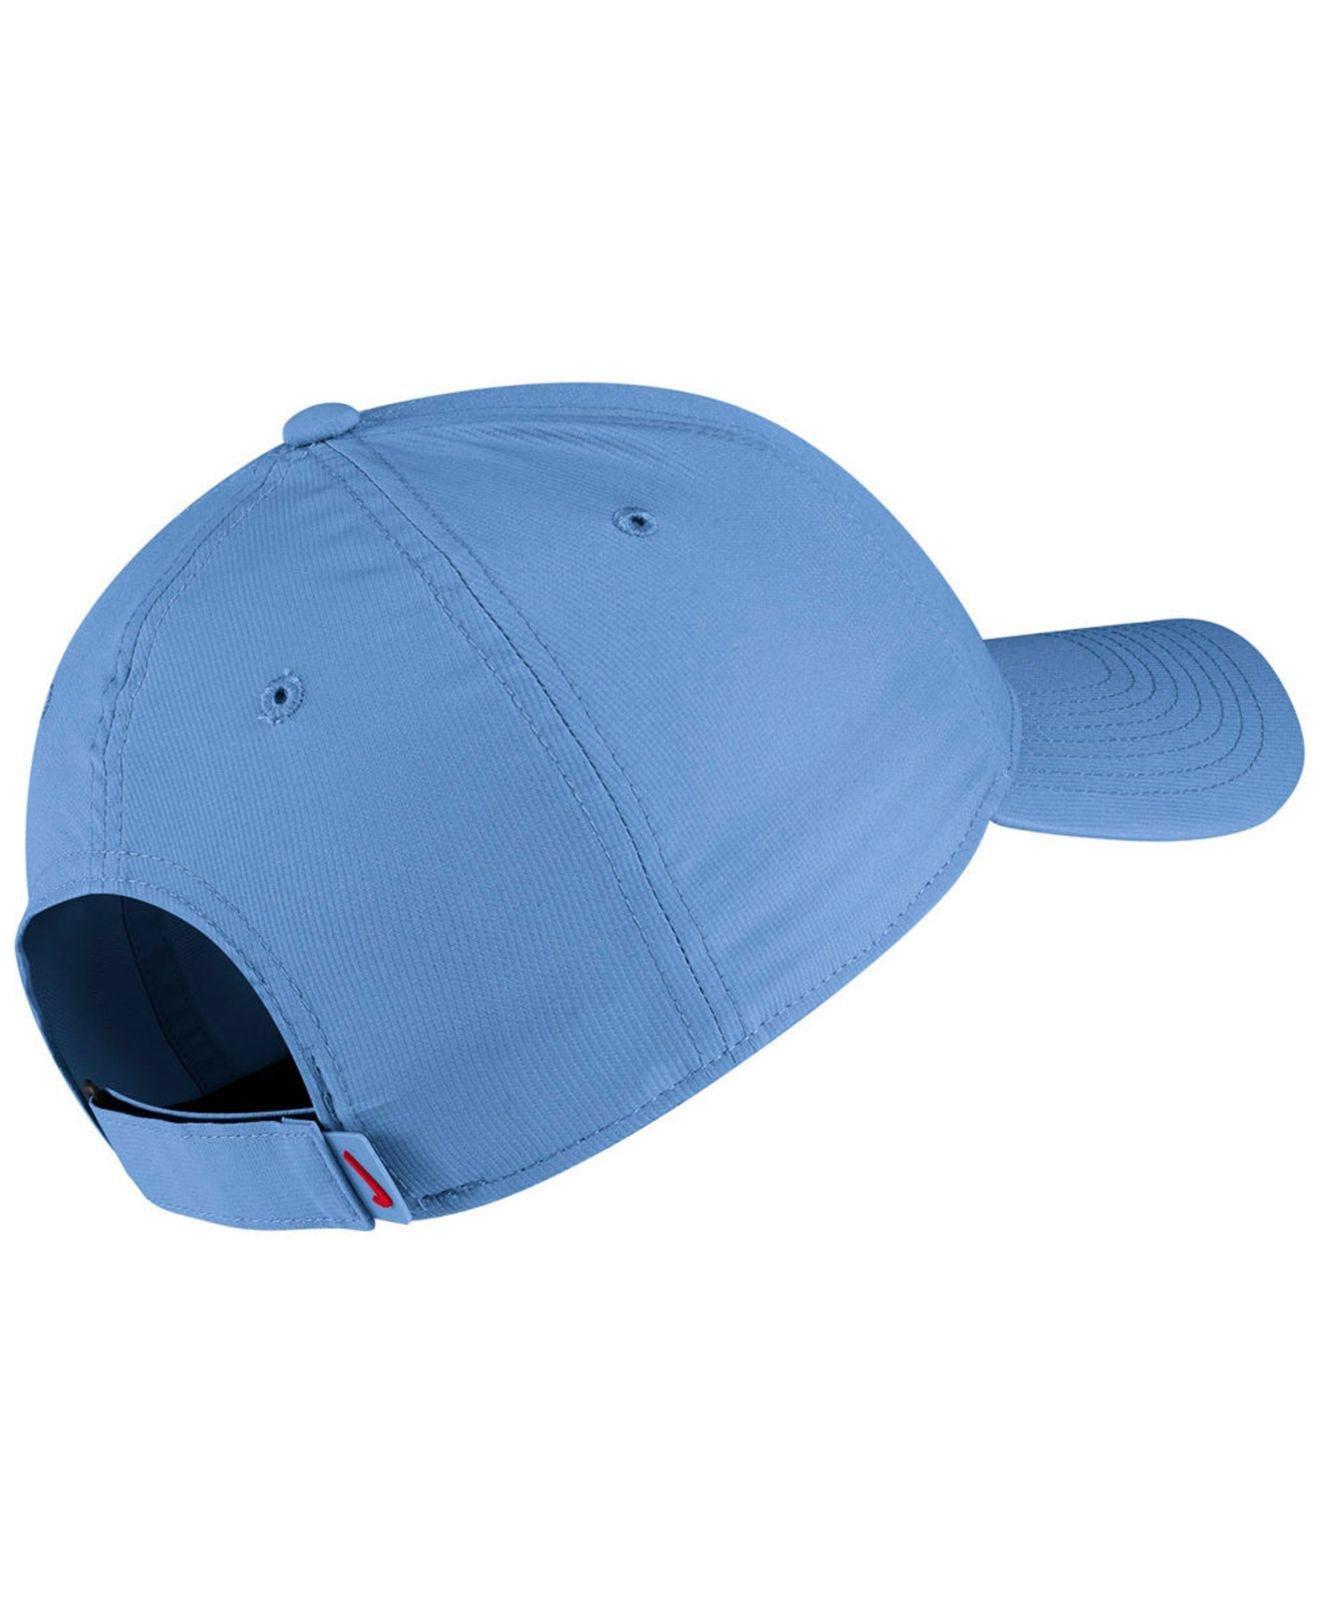 6eb73d5c410 Lyst - Nike Ole Miss Rebels Dri-fit Adjustable Cap in Blue for Men